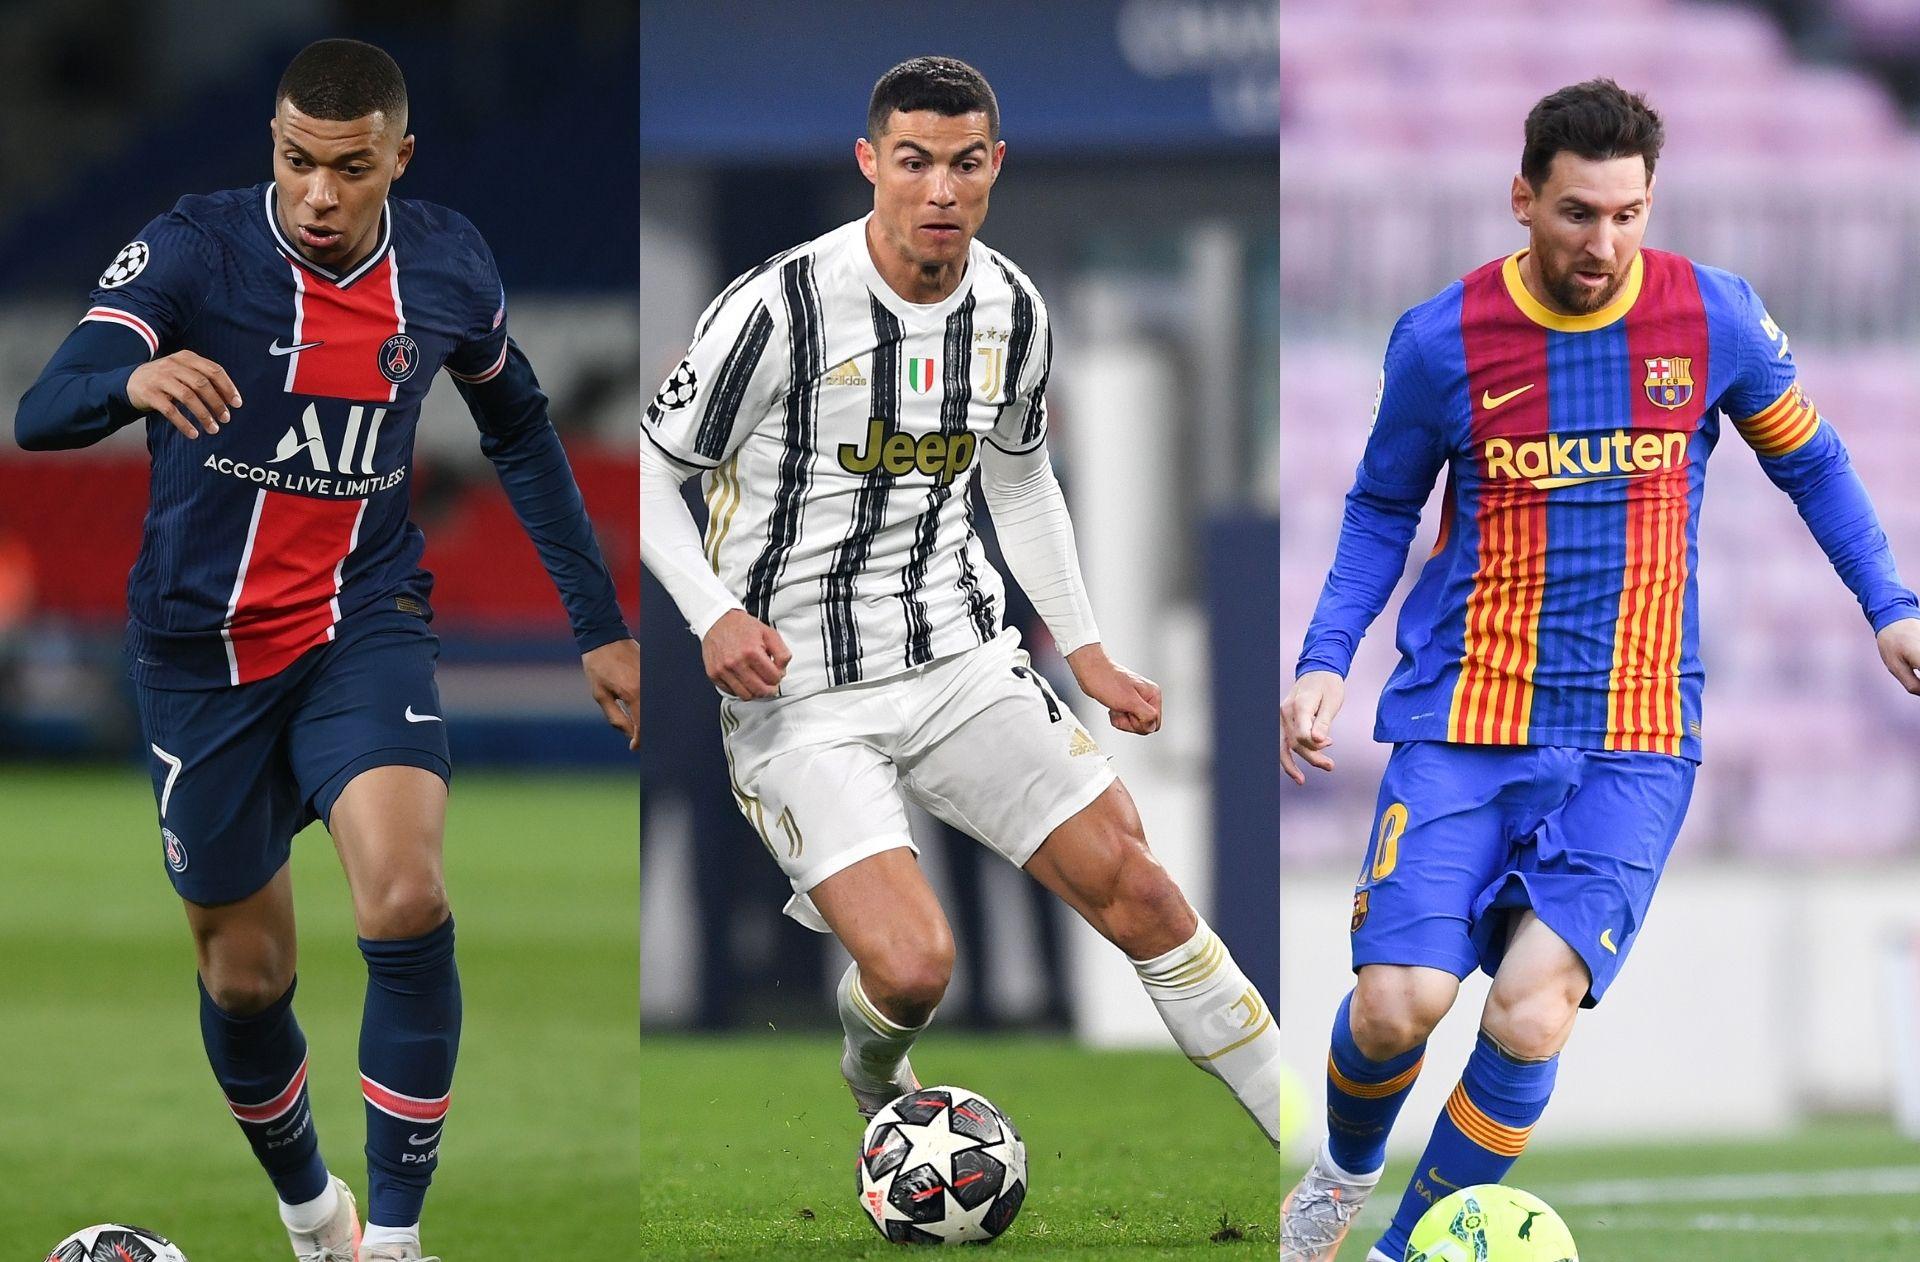 Mbappe of PSG, Ronaldo of Juventus, Messi of Barcelona